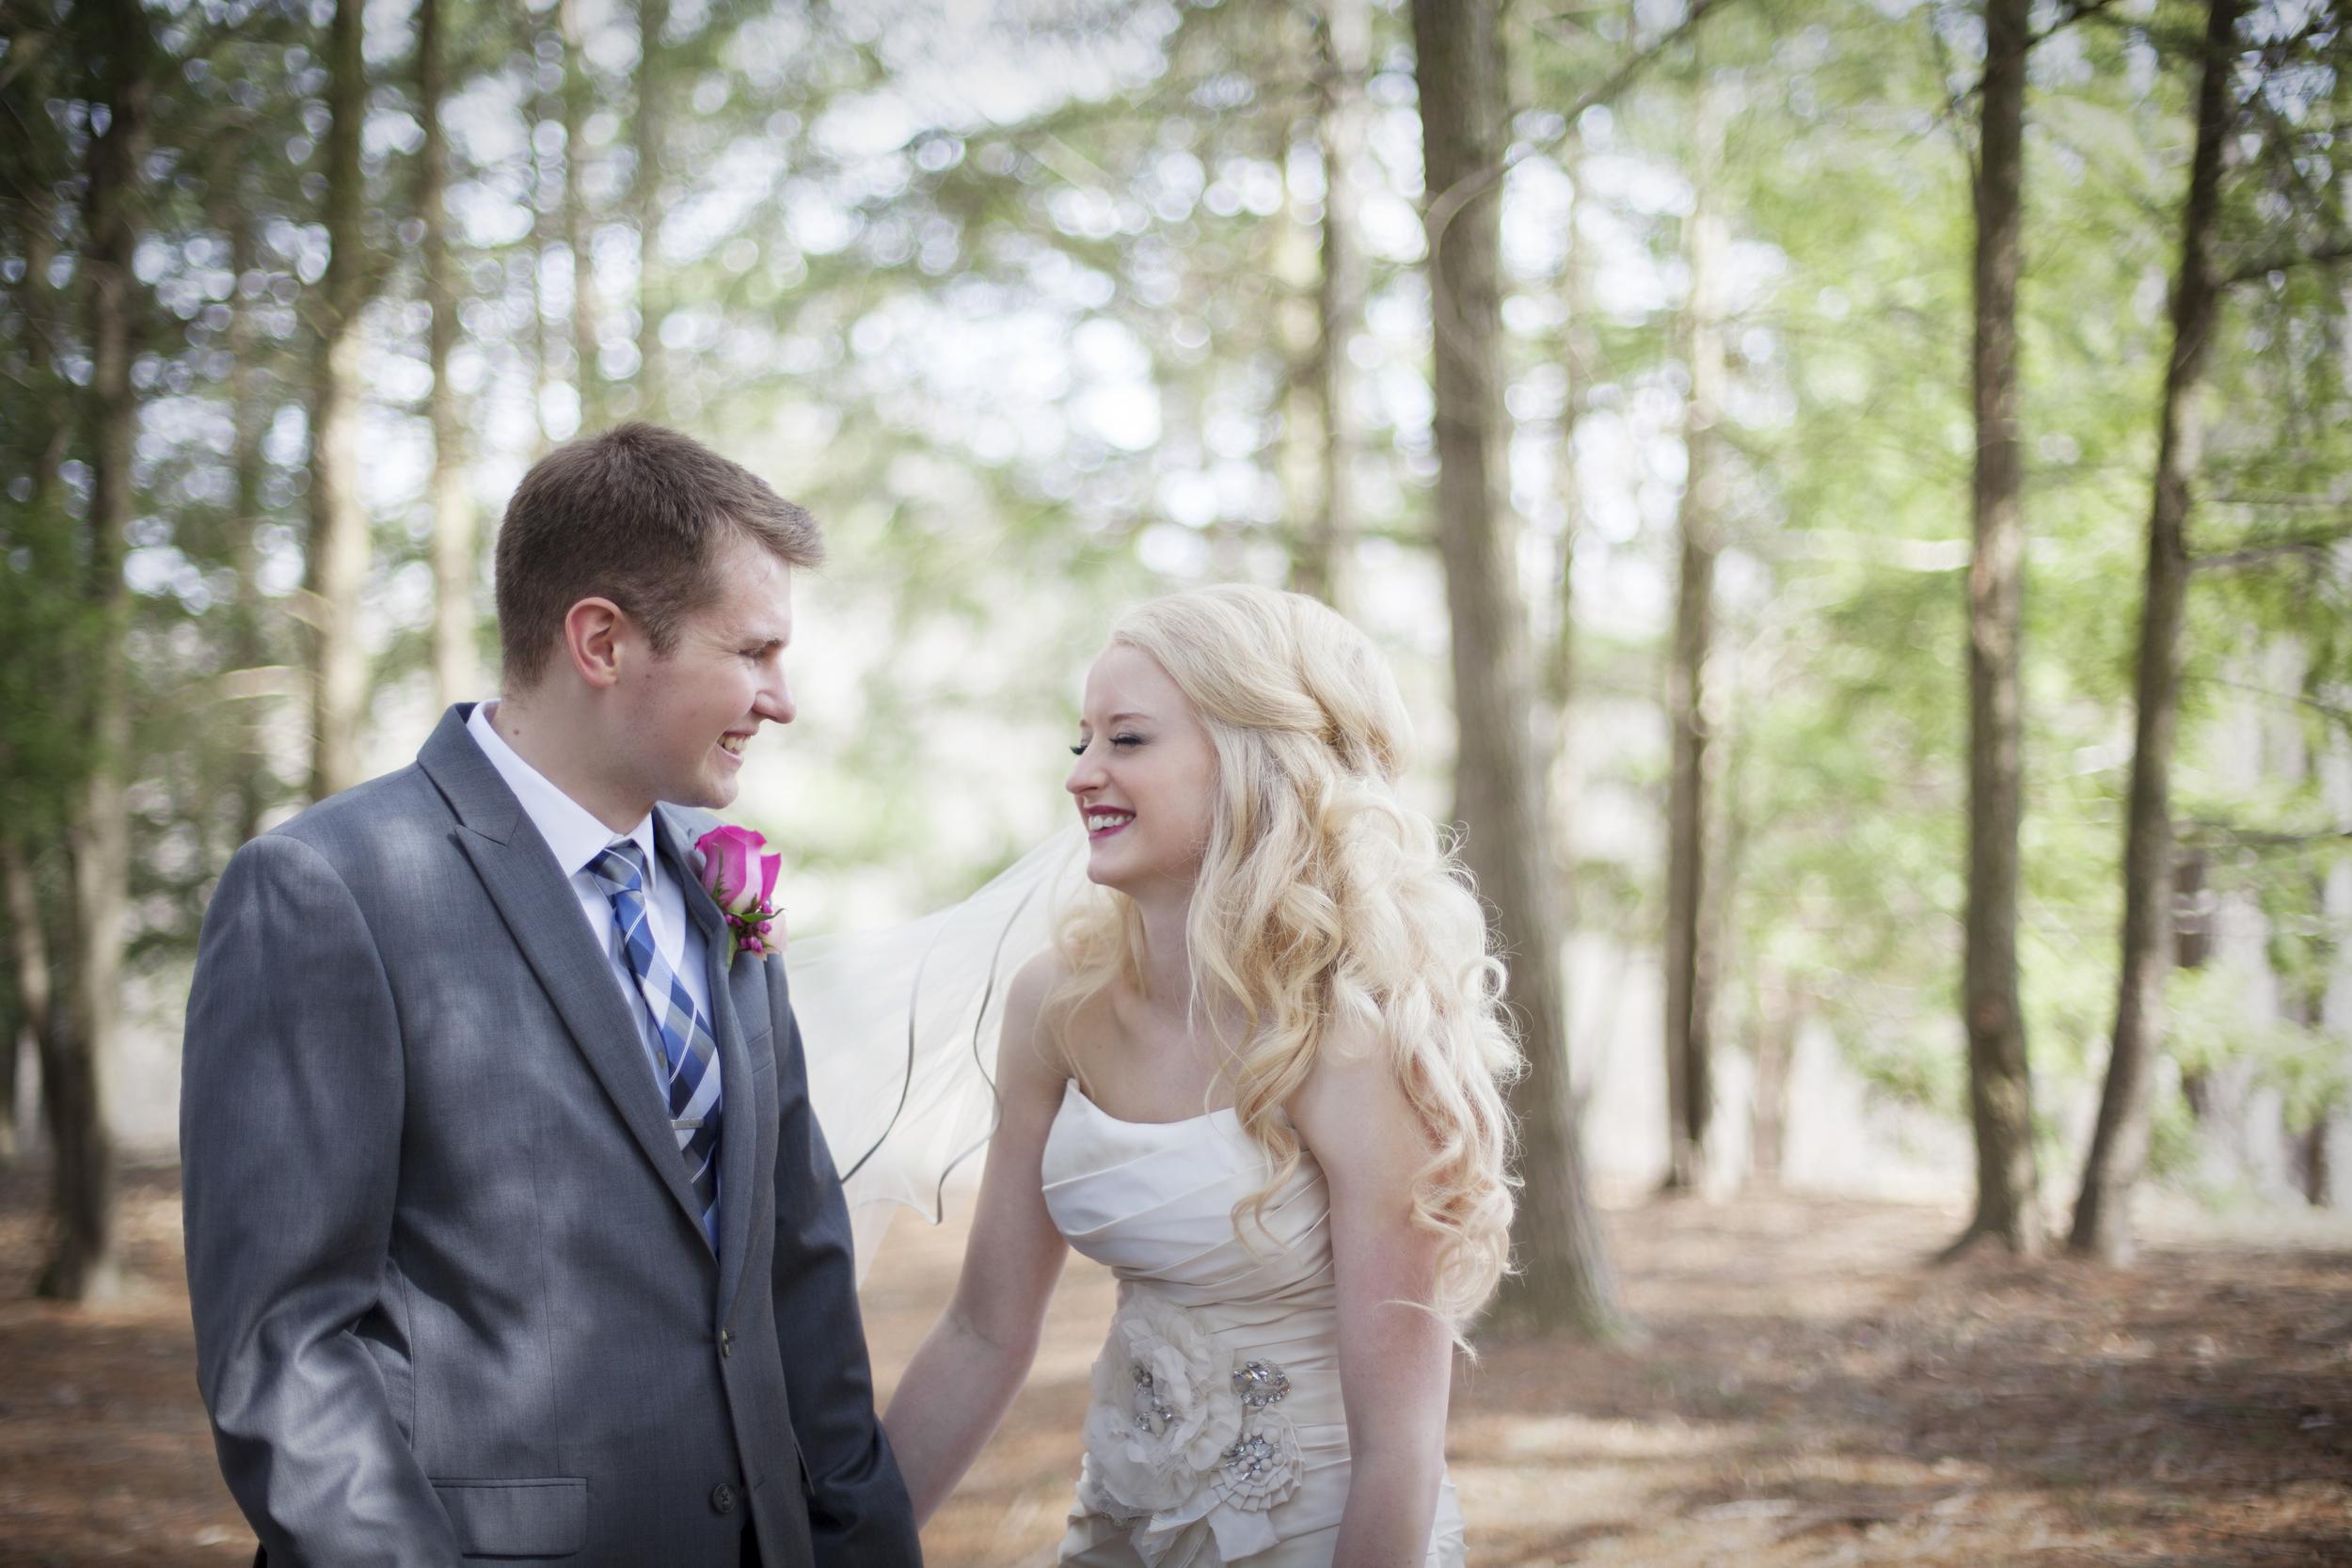 03_Fox_and_Hound_Photo_Wedding_Photography_4:12:14.jpg